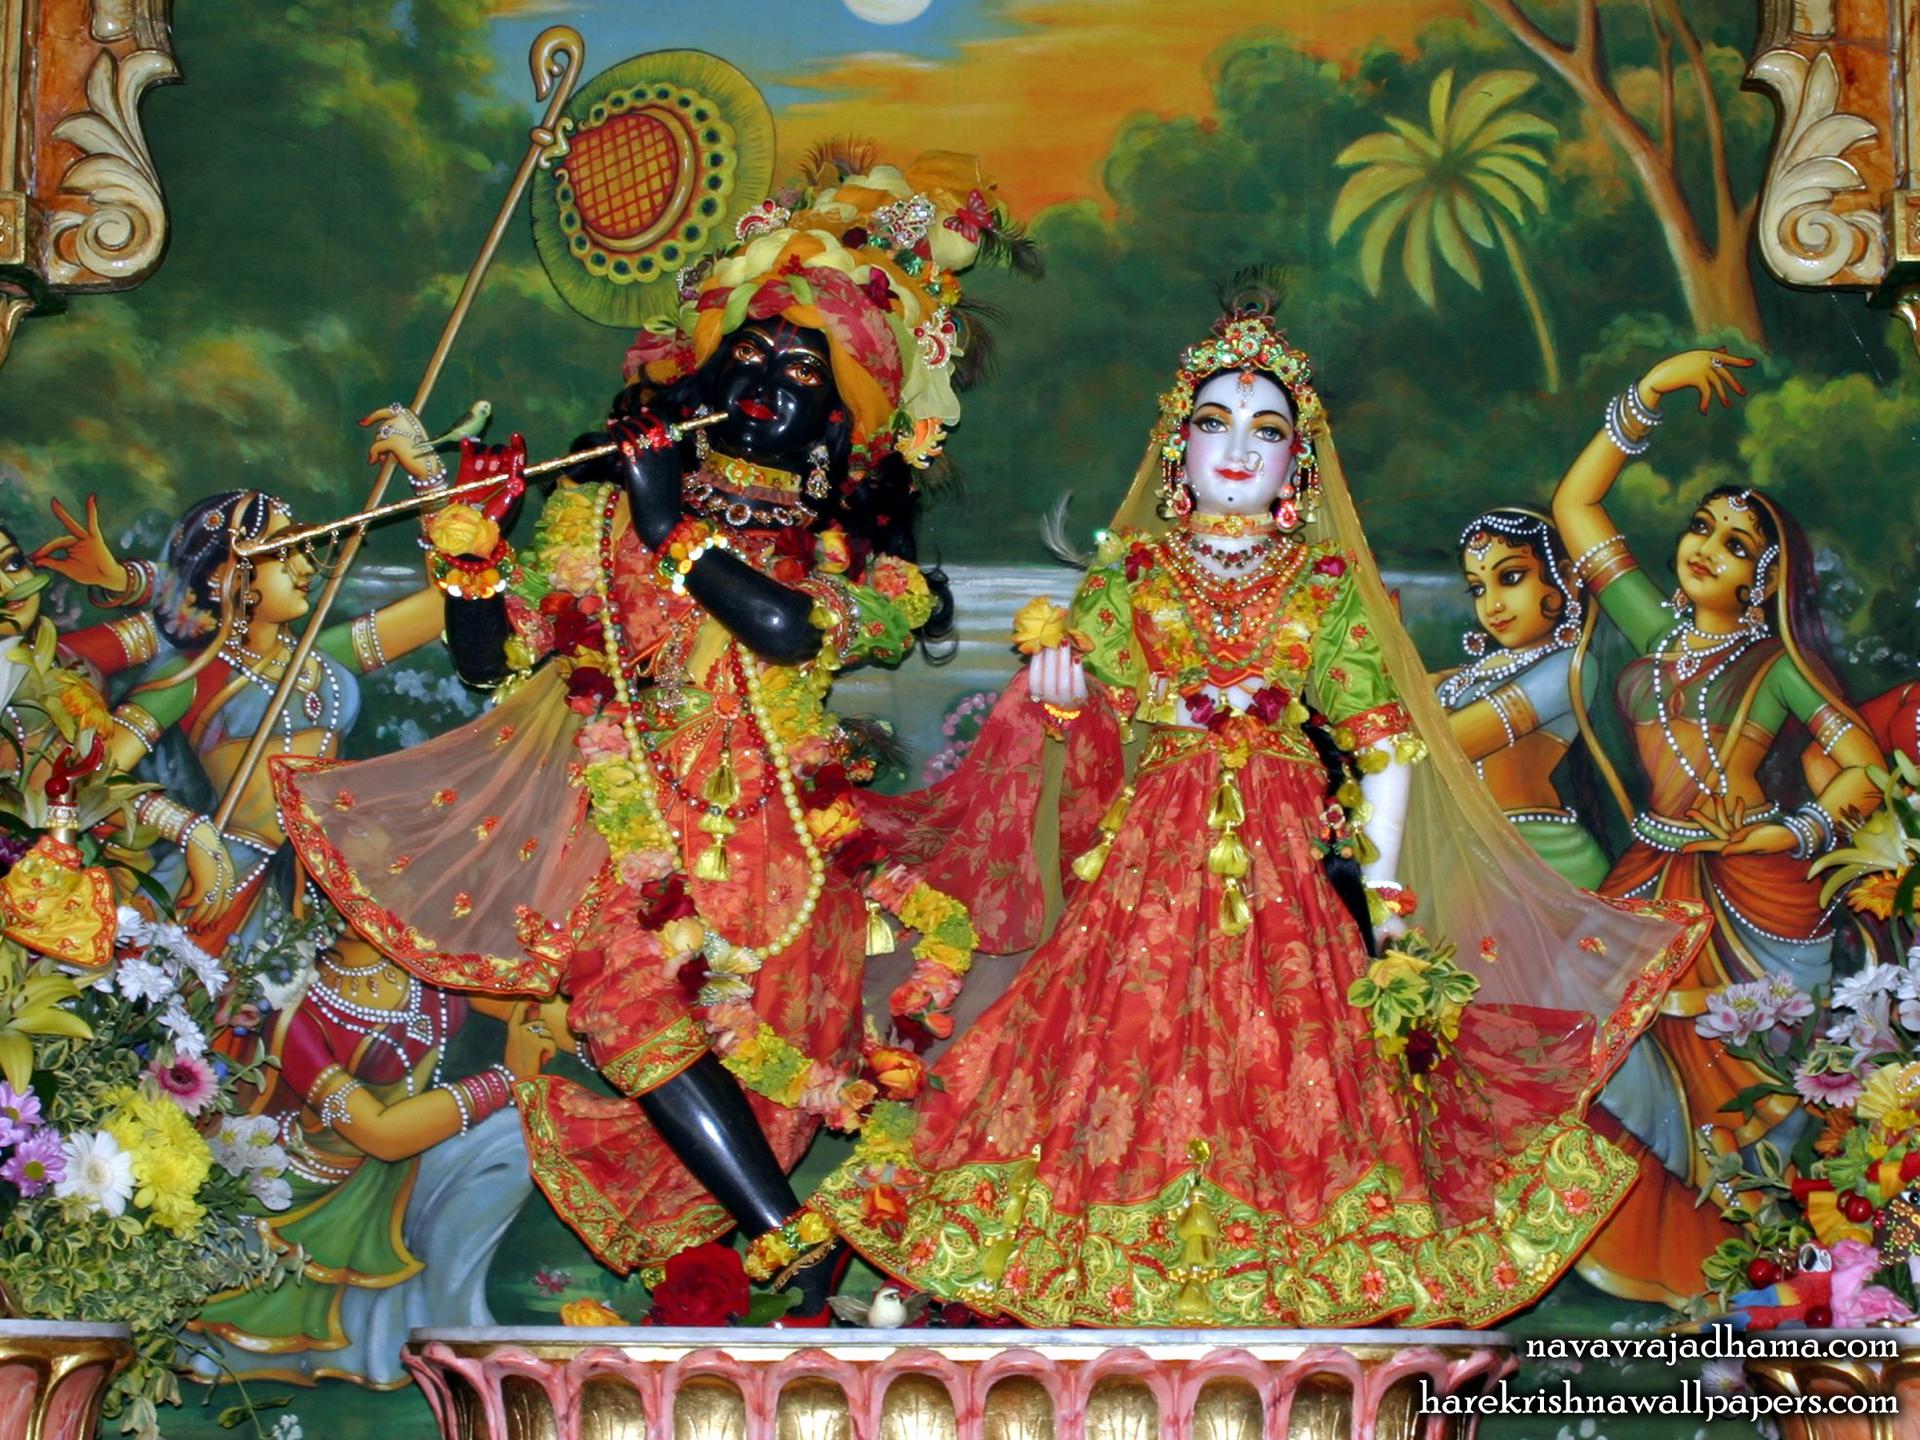 Sri Sri Radha Shyamsundar Wallpaper (003) Size 1920x1440 Download